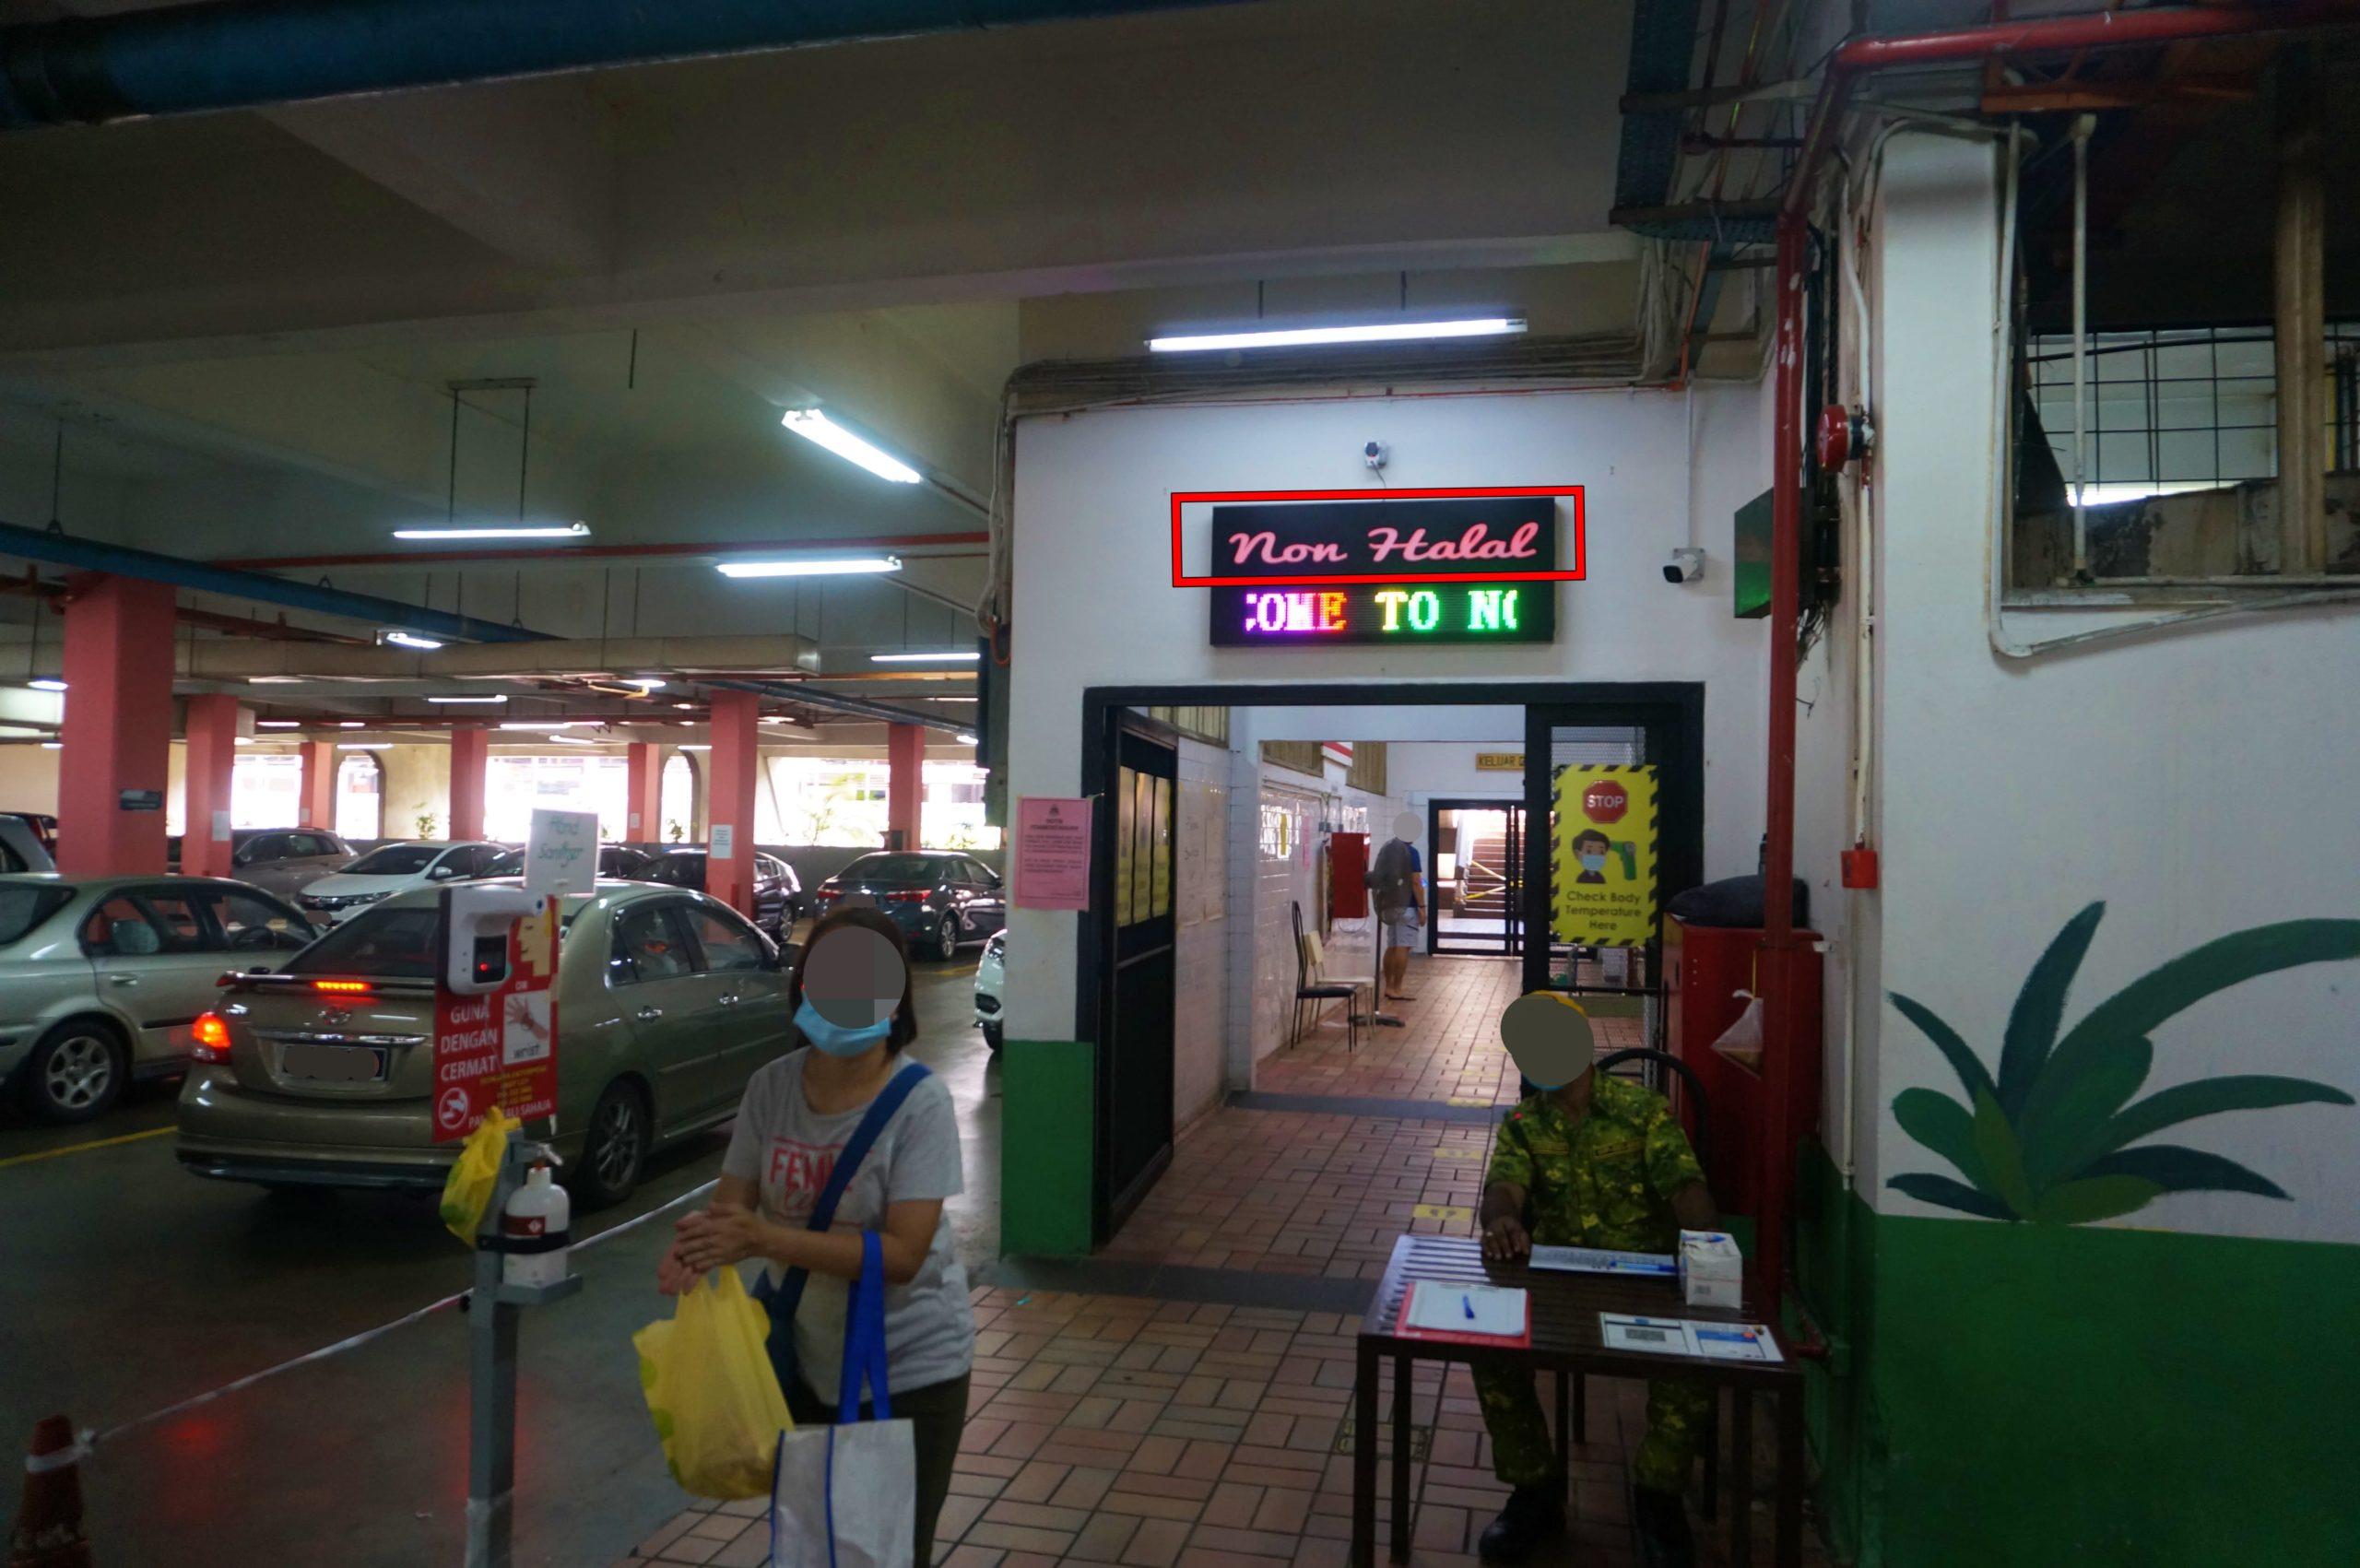 TTDI wet market non-halal